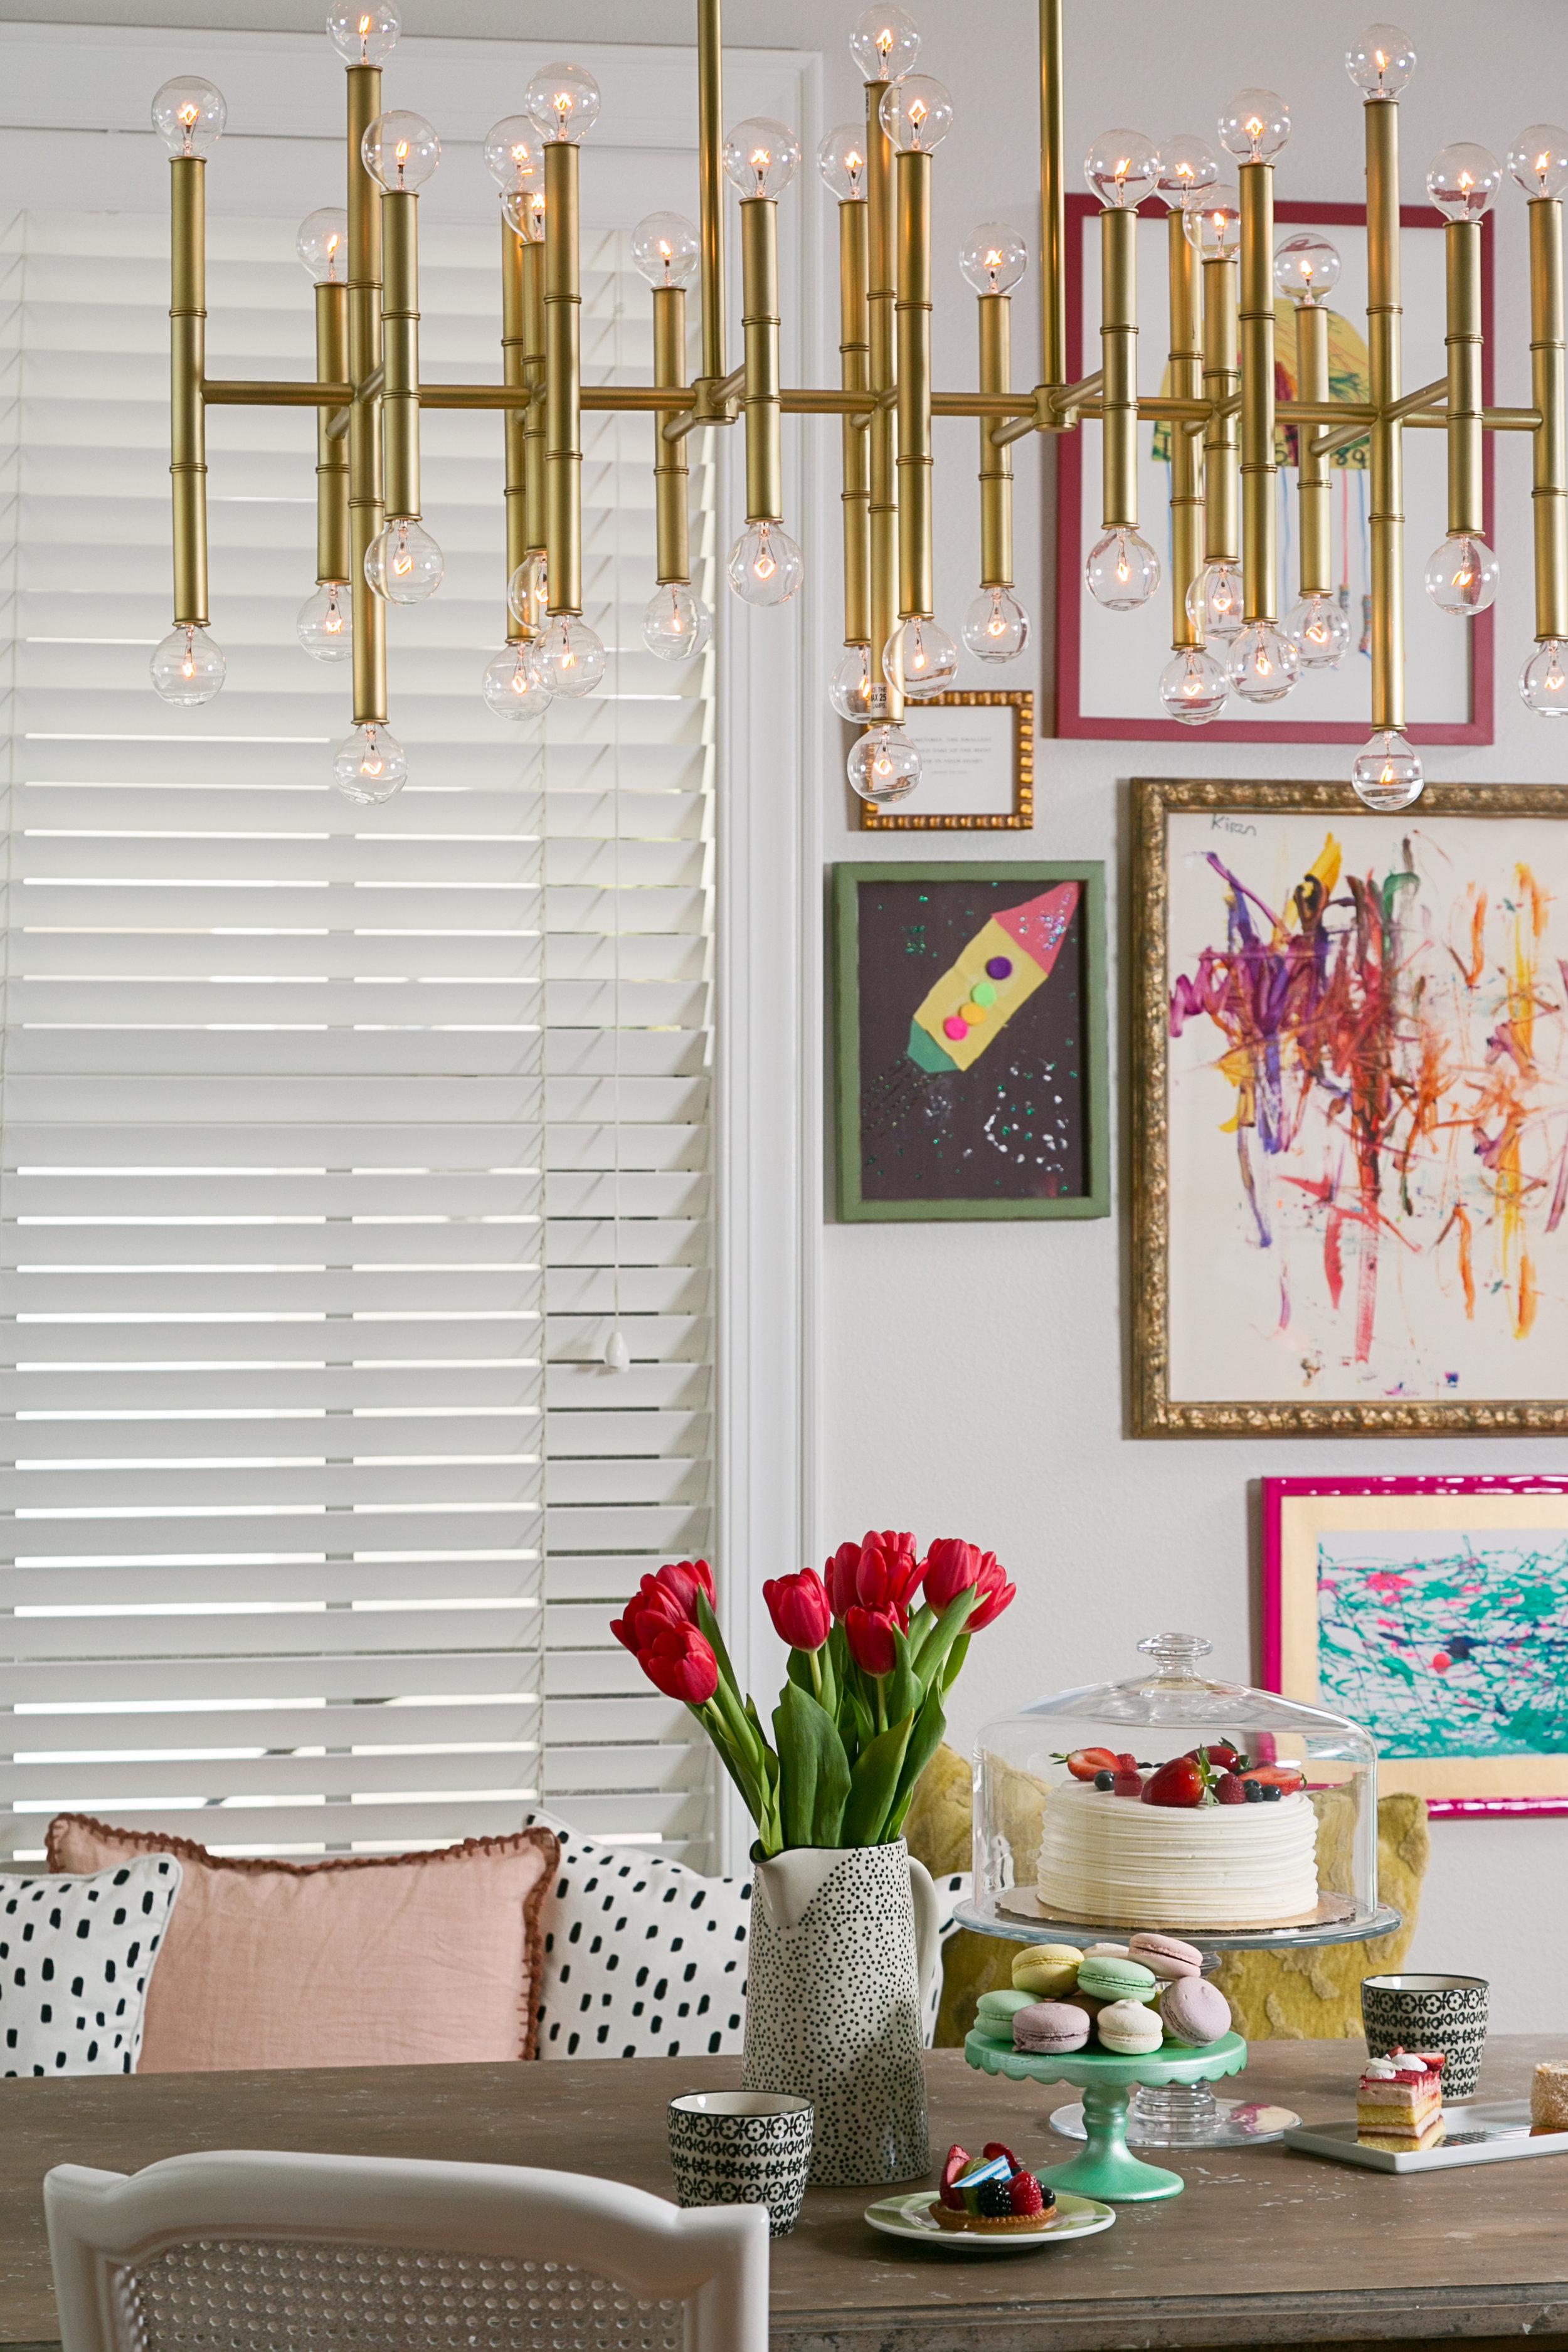 glam family friendly kitchen nook - lisa gilmore design